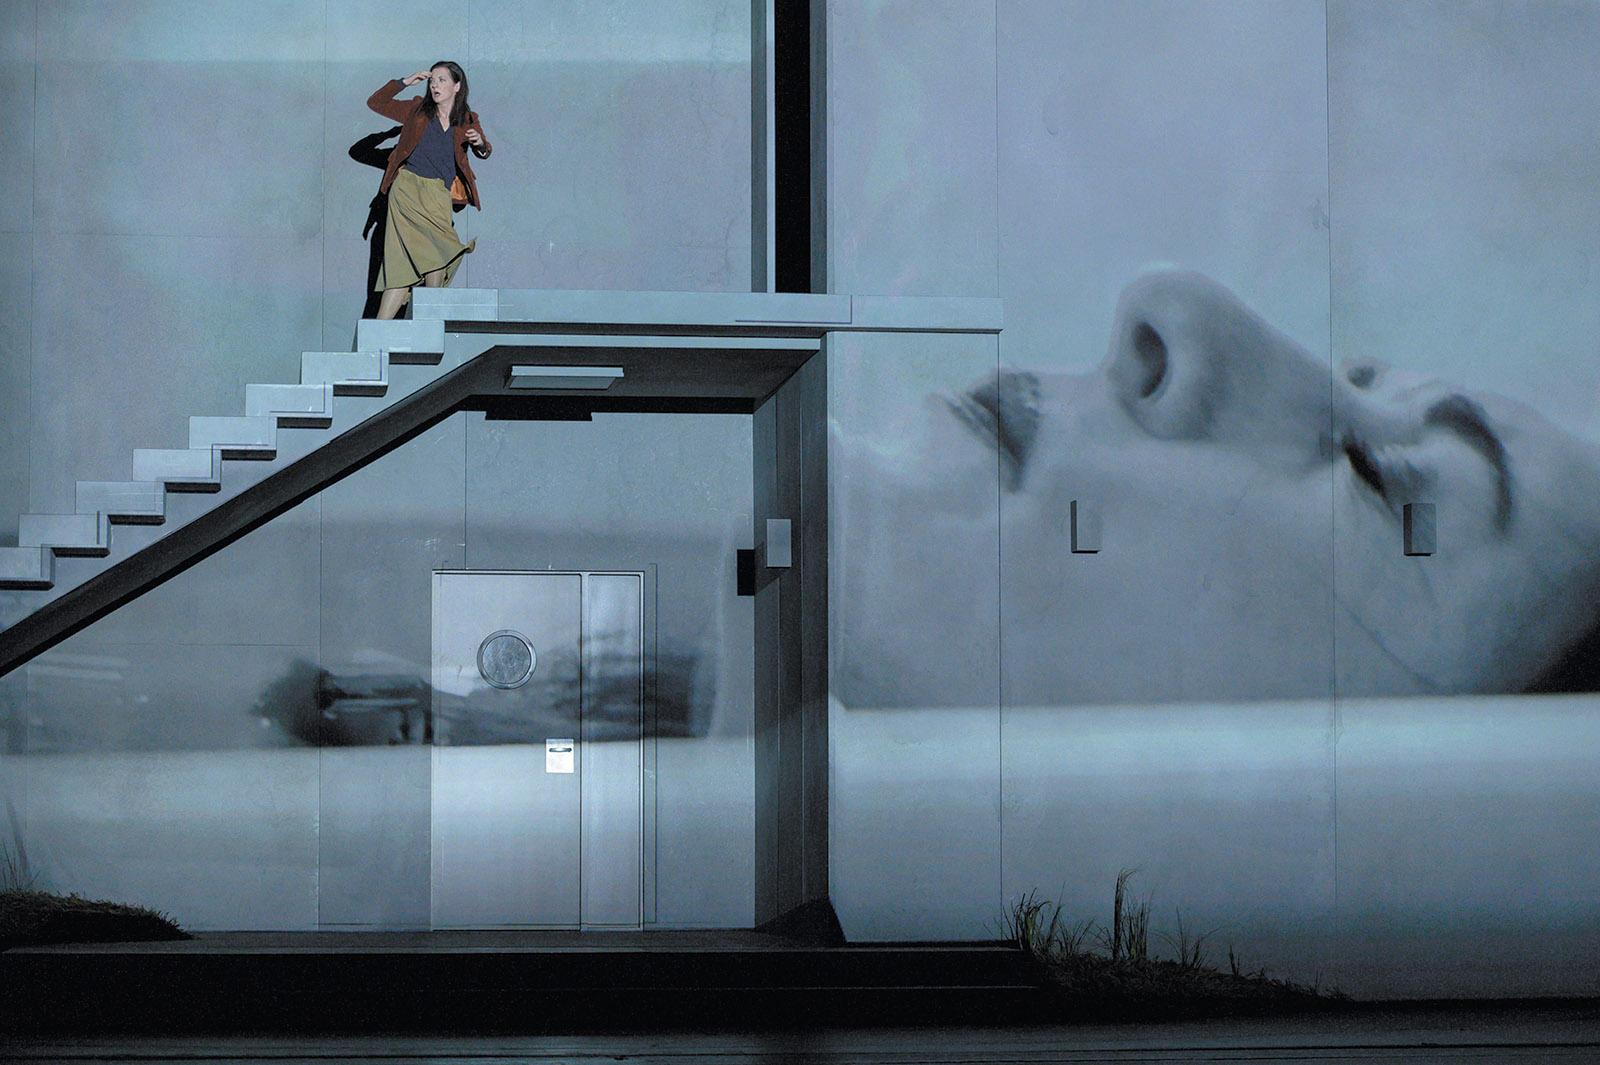 Patrizia Ciofi as She in Heart Chamber at the Deutsche Oper Berlin